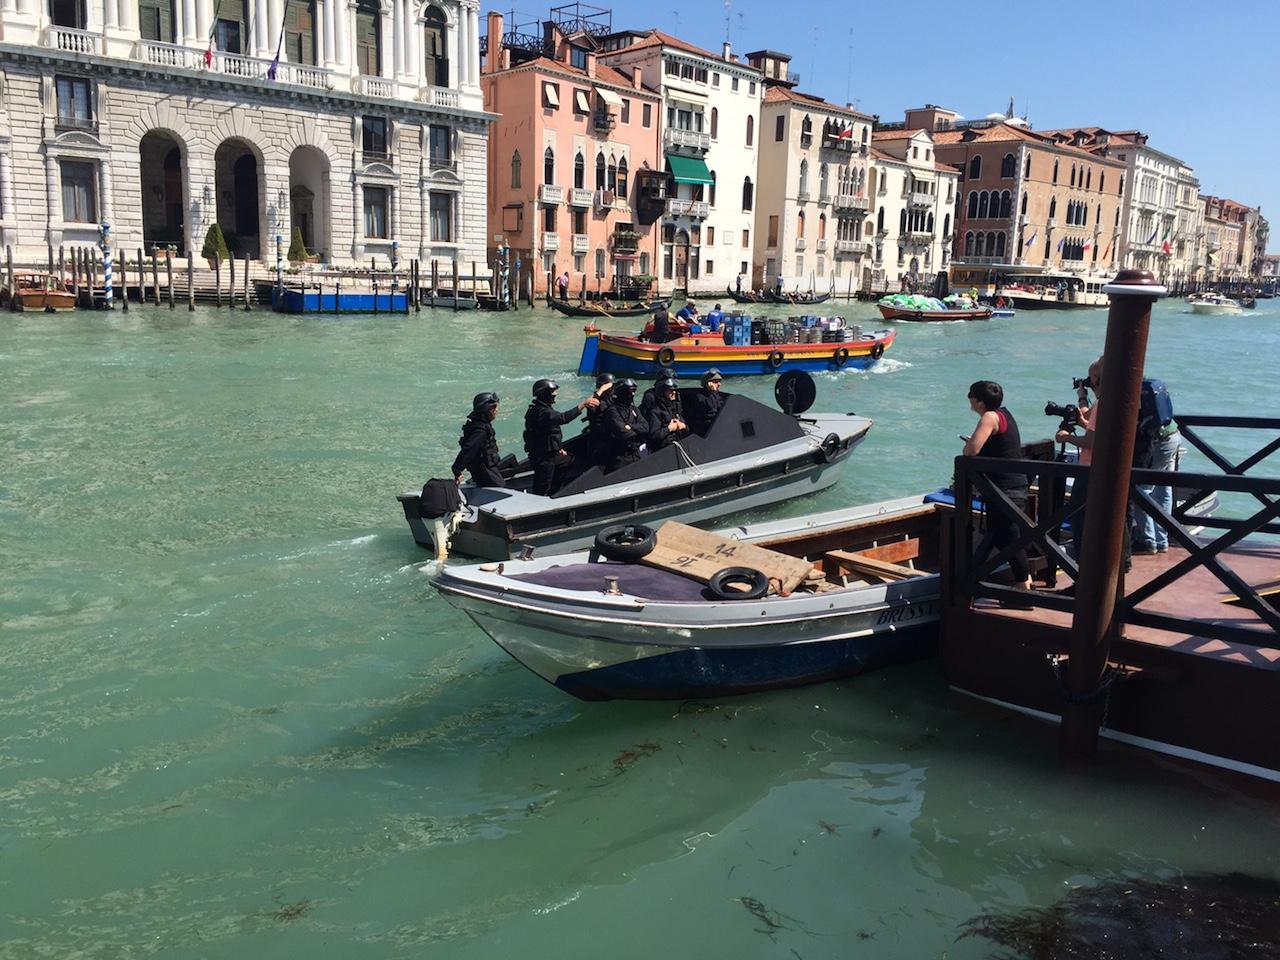 Venetian police survey the scene at Friday's protest